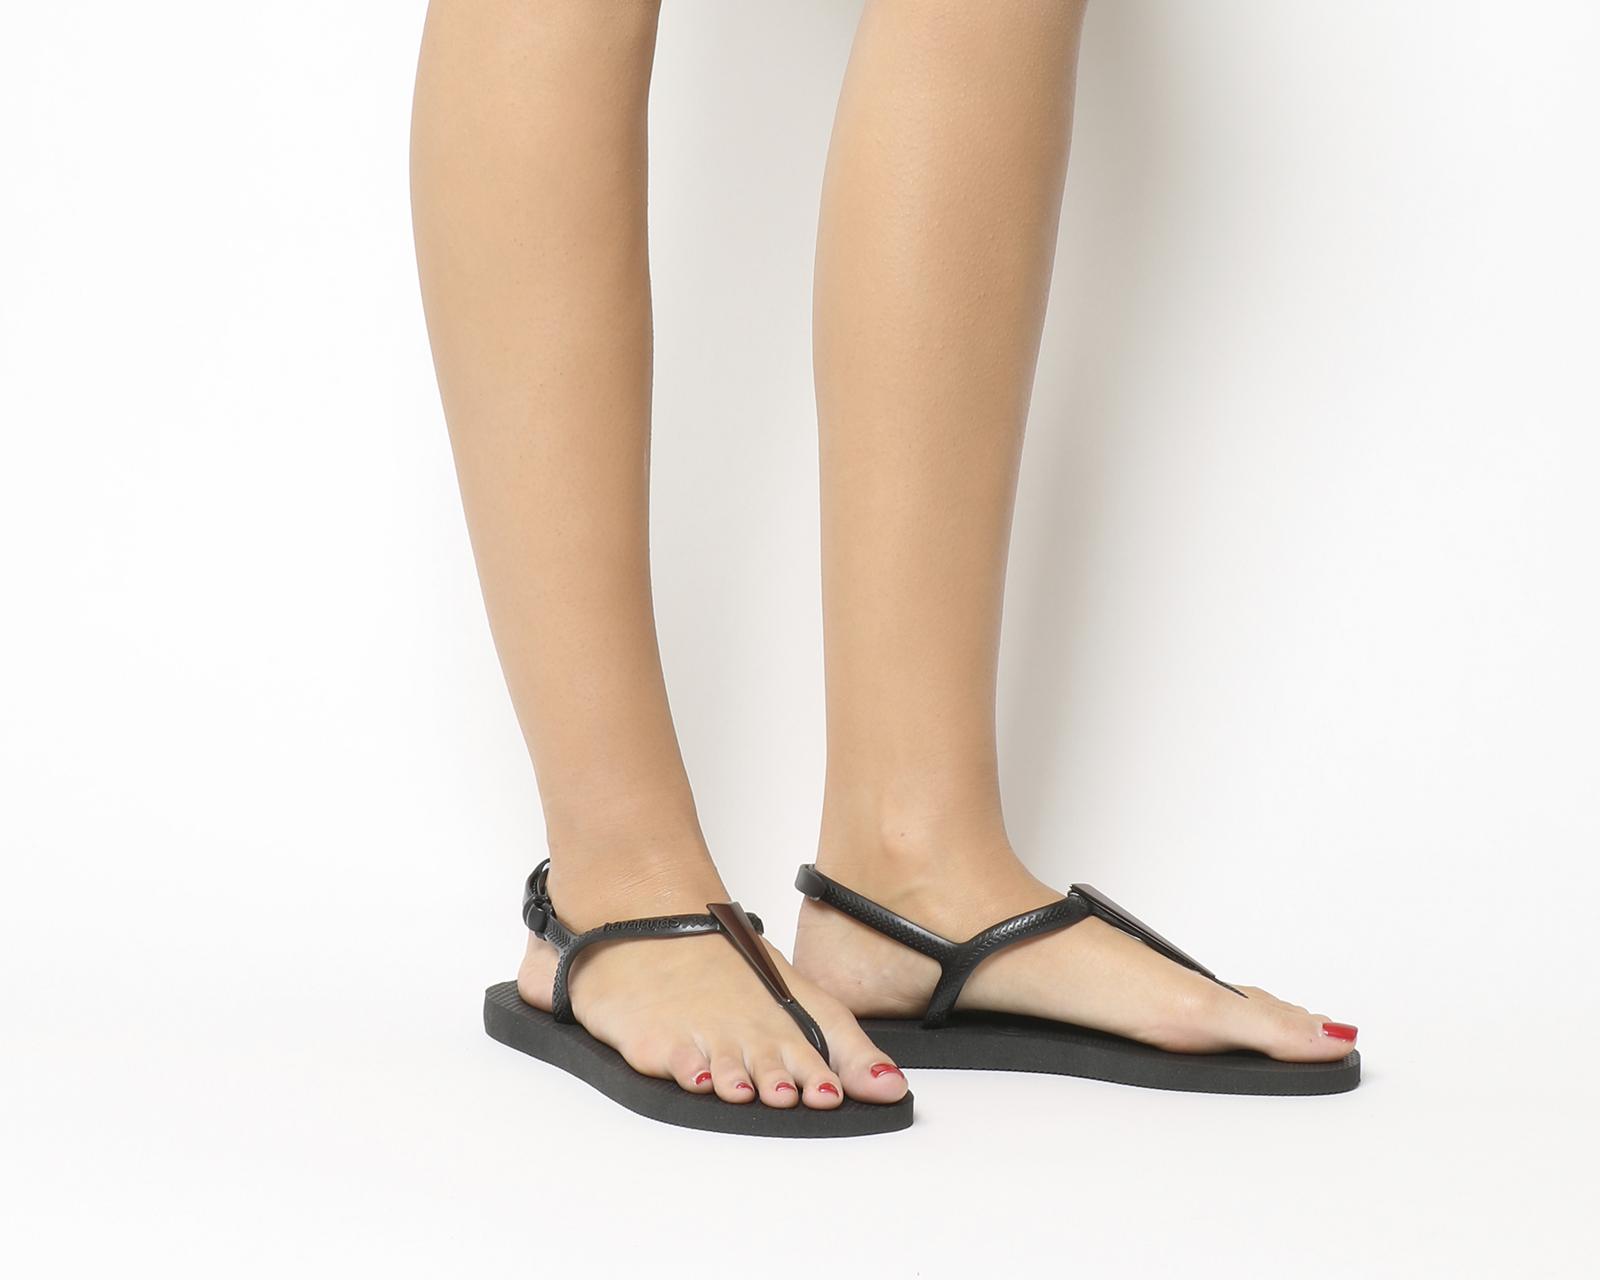 aee5d4073ad Sentinel Womens Havaianas Freedom Sl Maxi Black Sandals. Sentinel Thumbnail  2